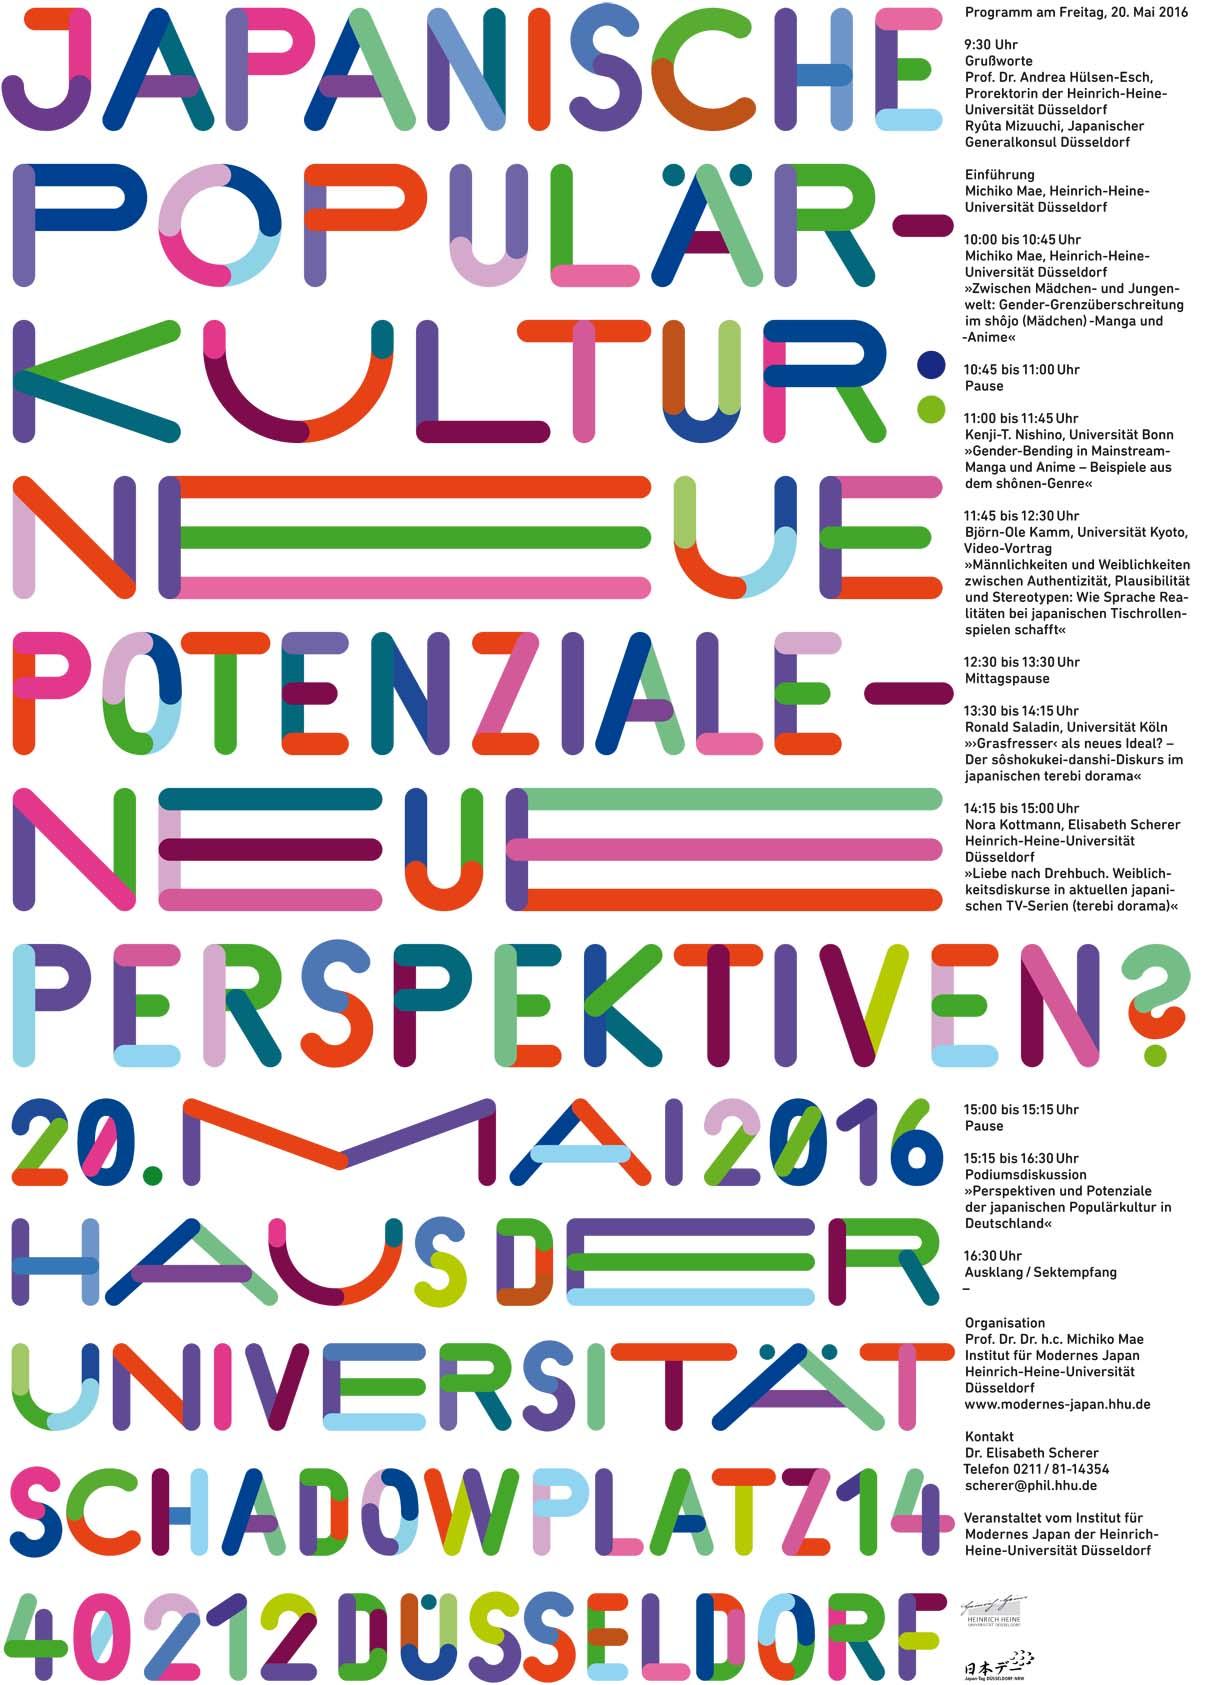 160423_symposium_neue_perspektiven_v2_RZ.indd